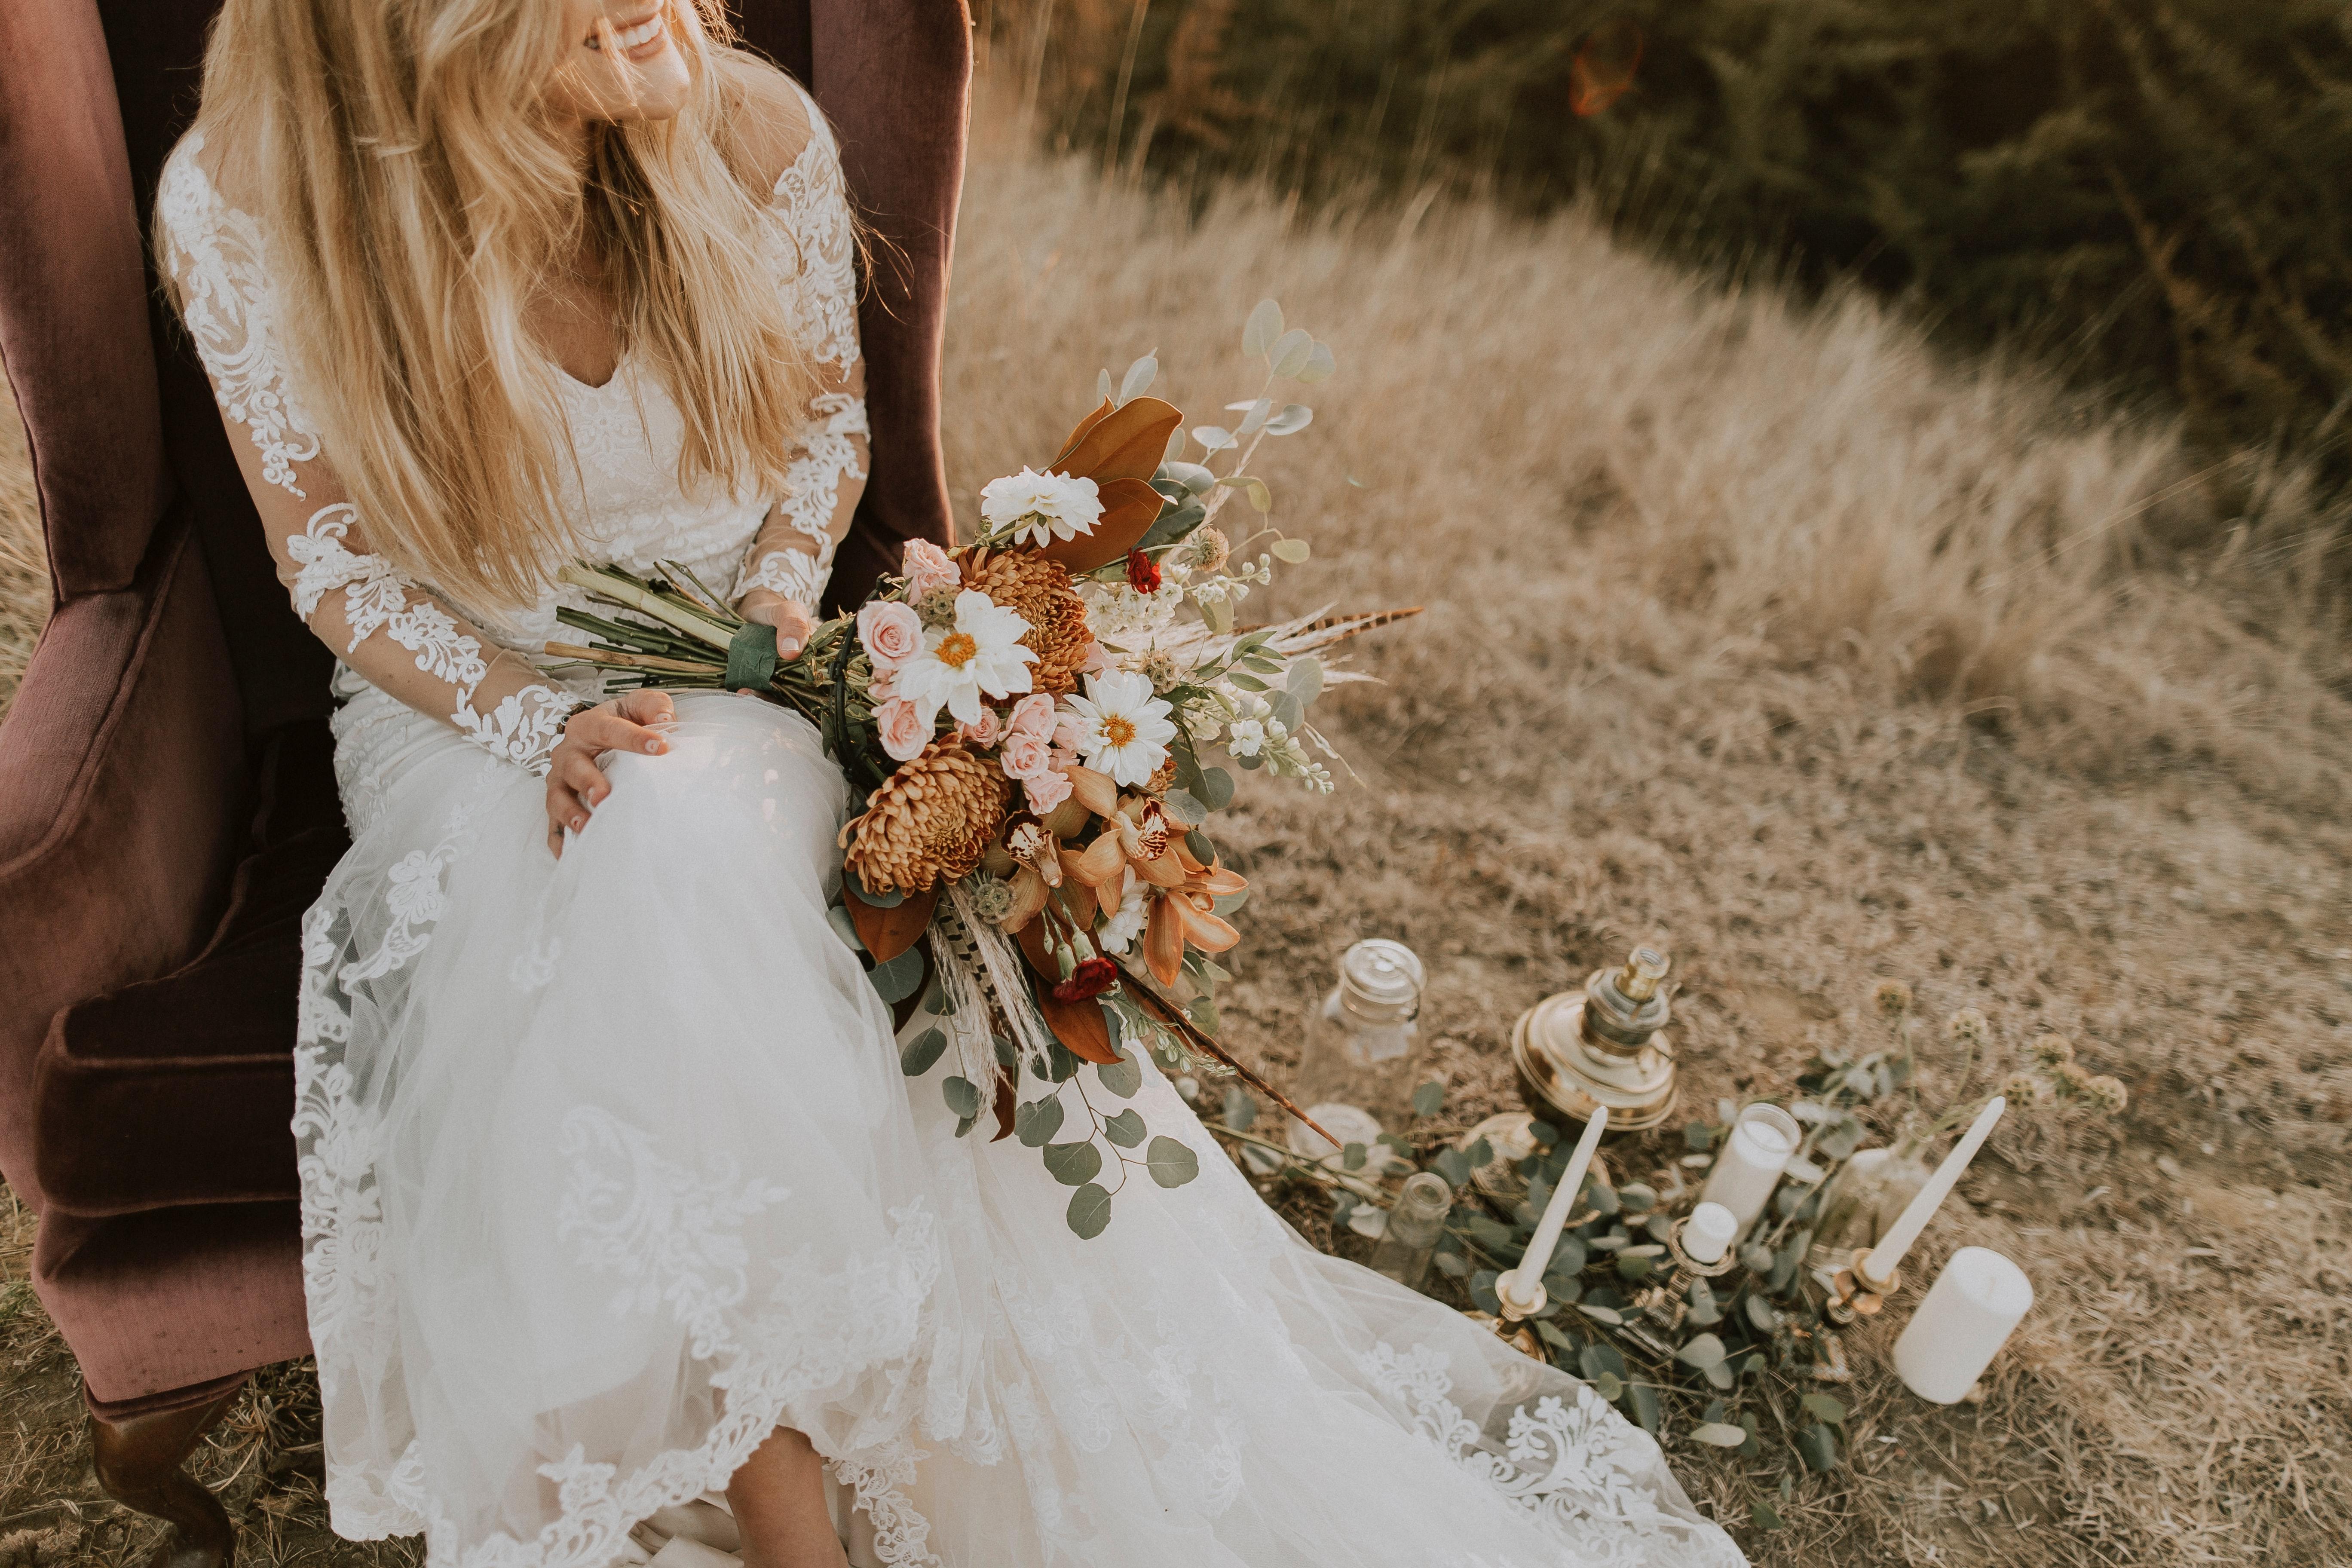 robe de mariée unsplash